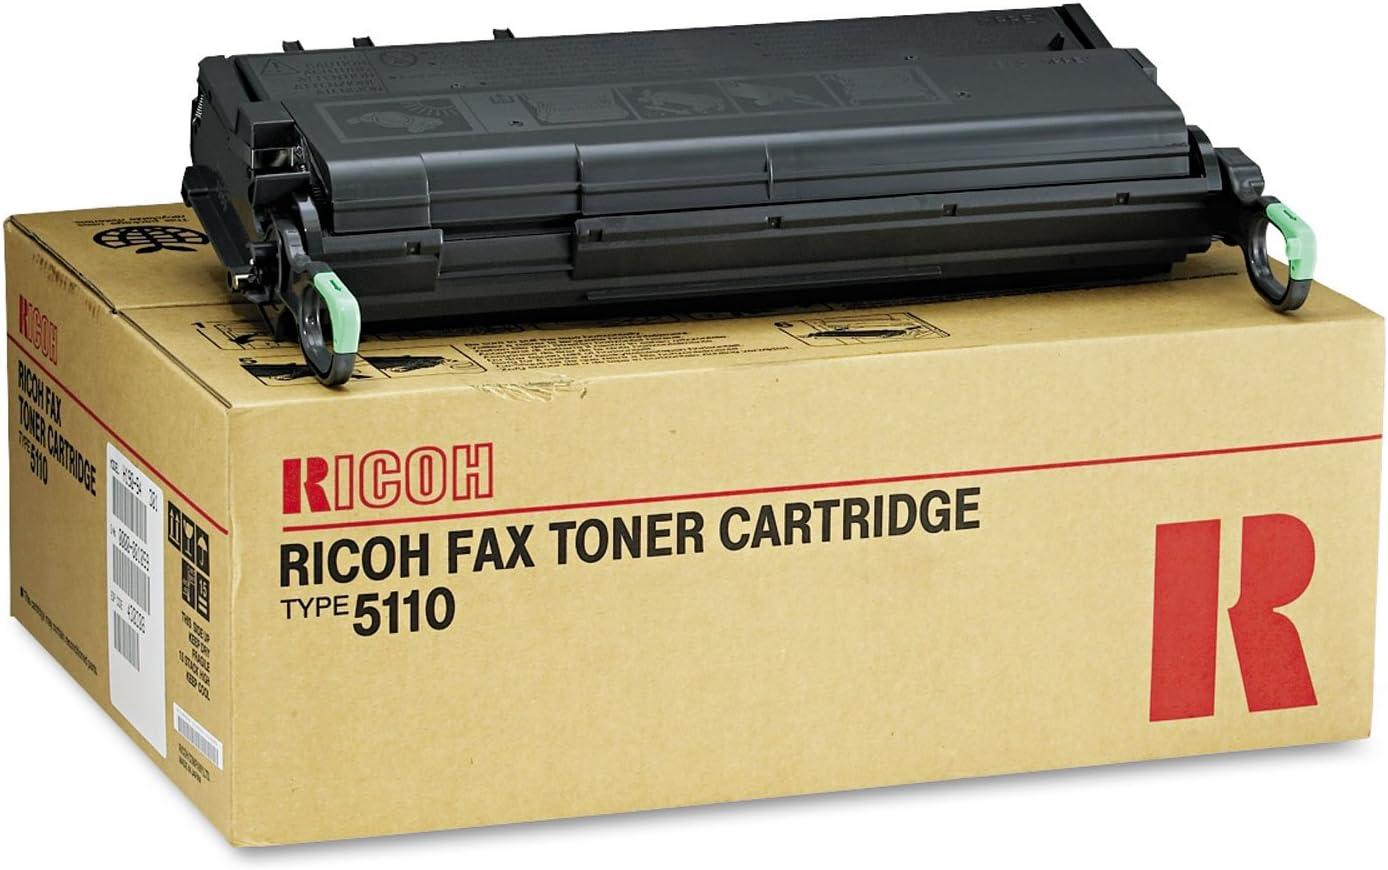 RIC430452 - Ricoh 430452 Toner 71d65-aZMMLSL1500_